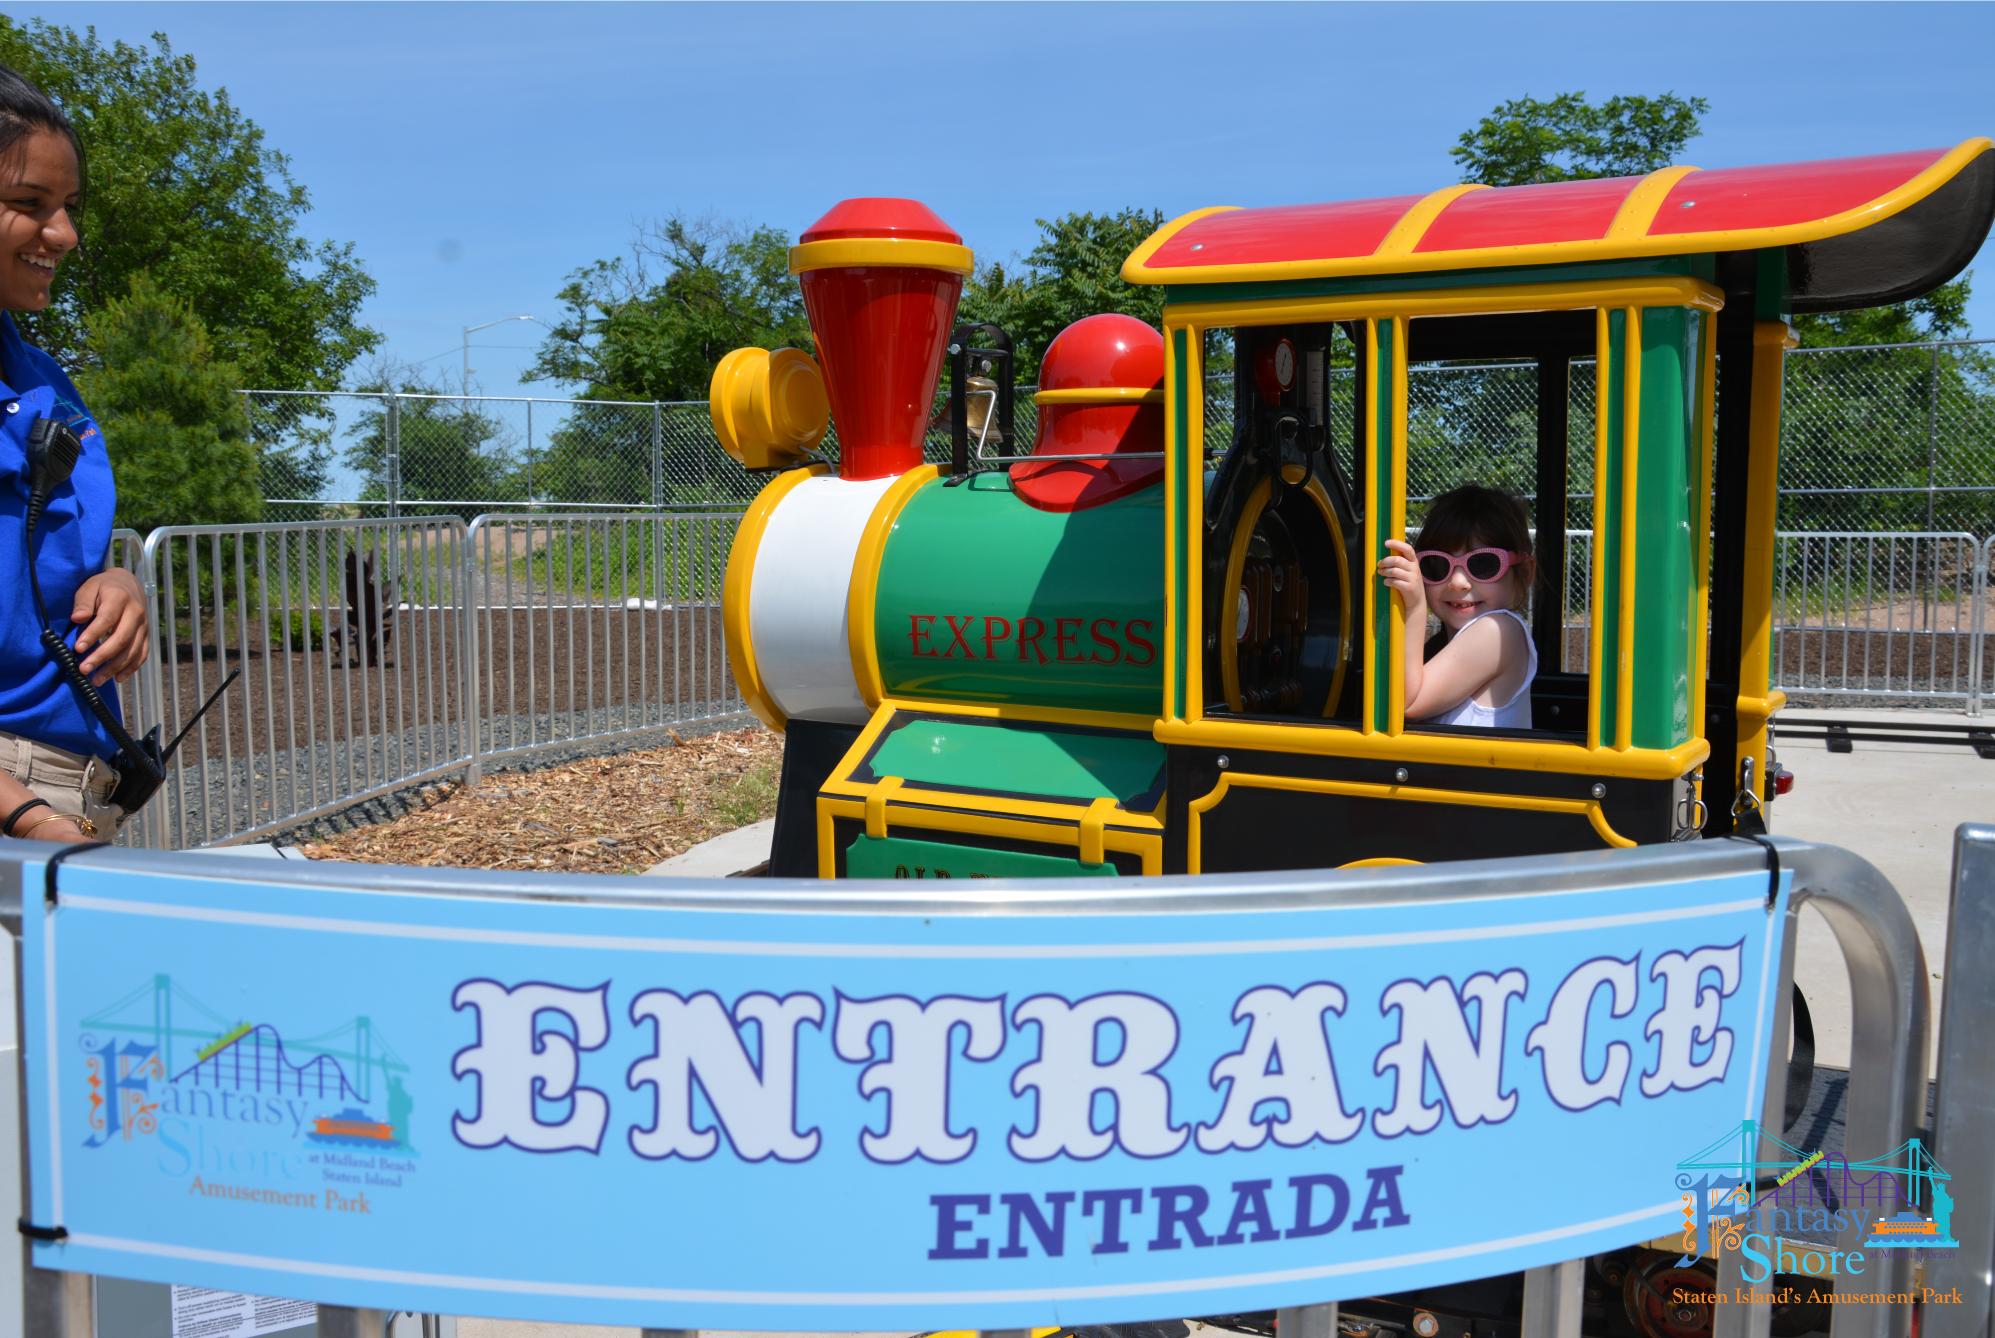 Staten Island Railroad Ride Entertainments